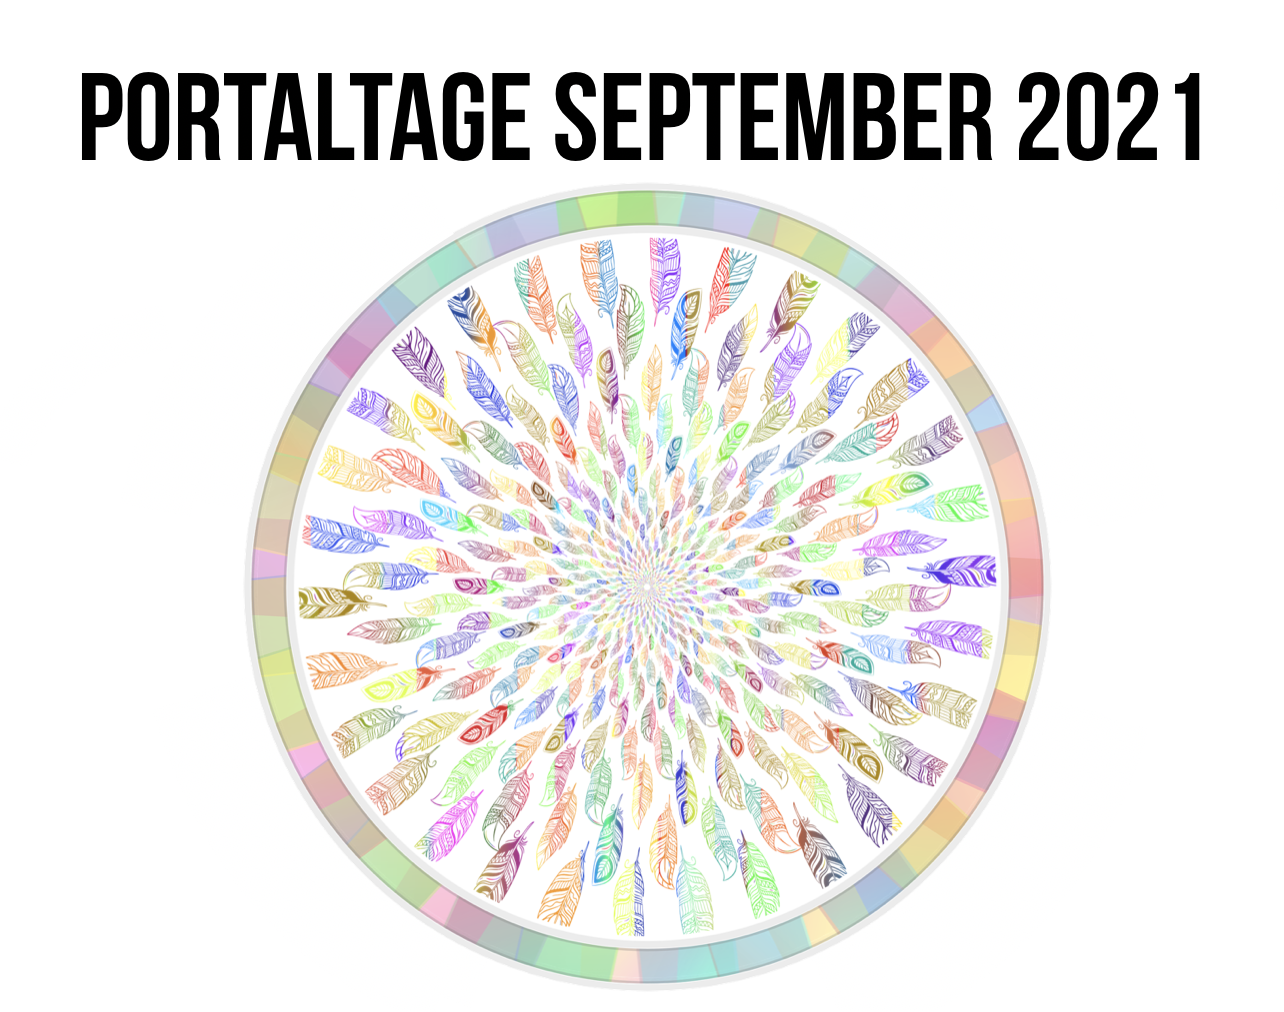 Portaltage im September 2021